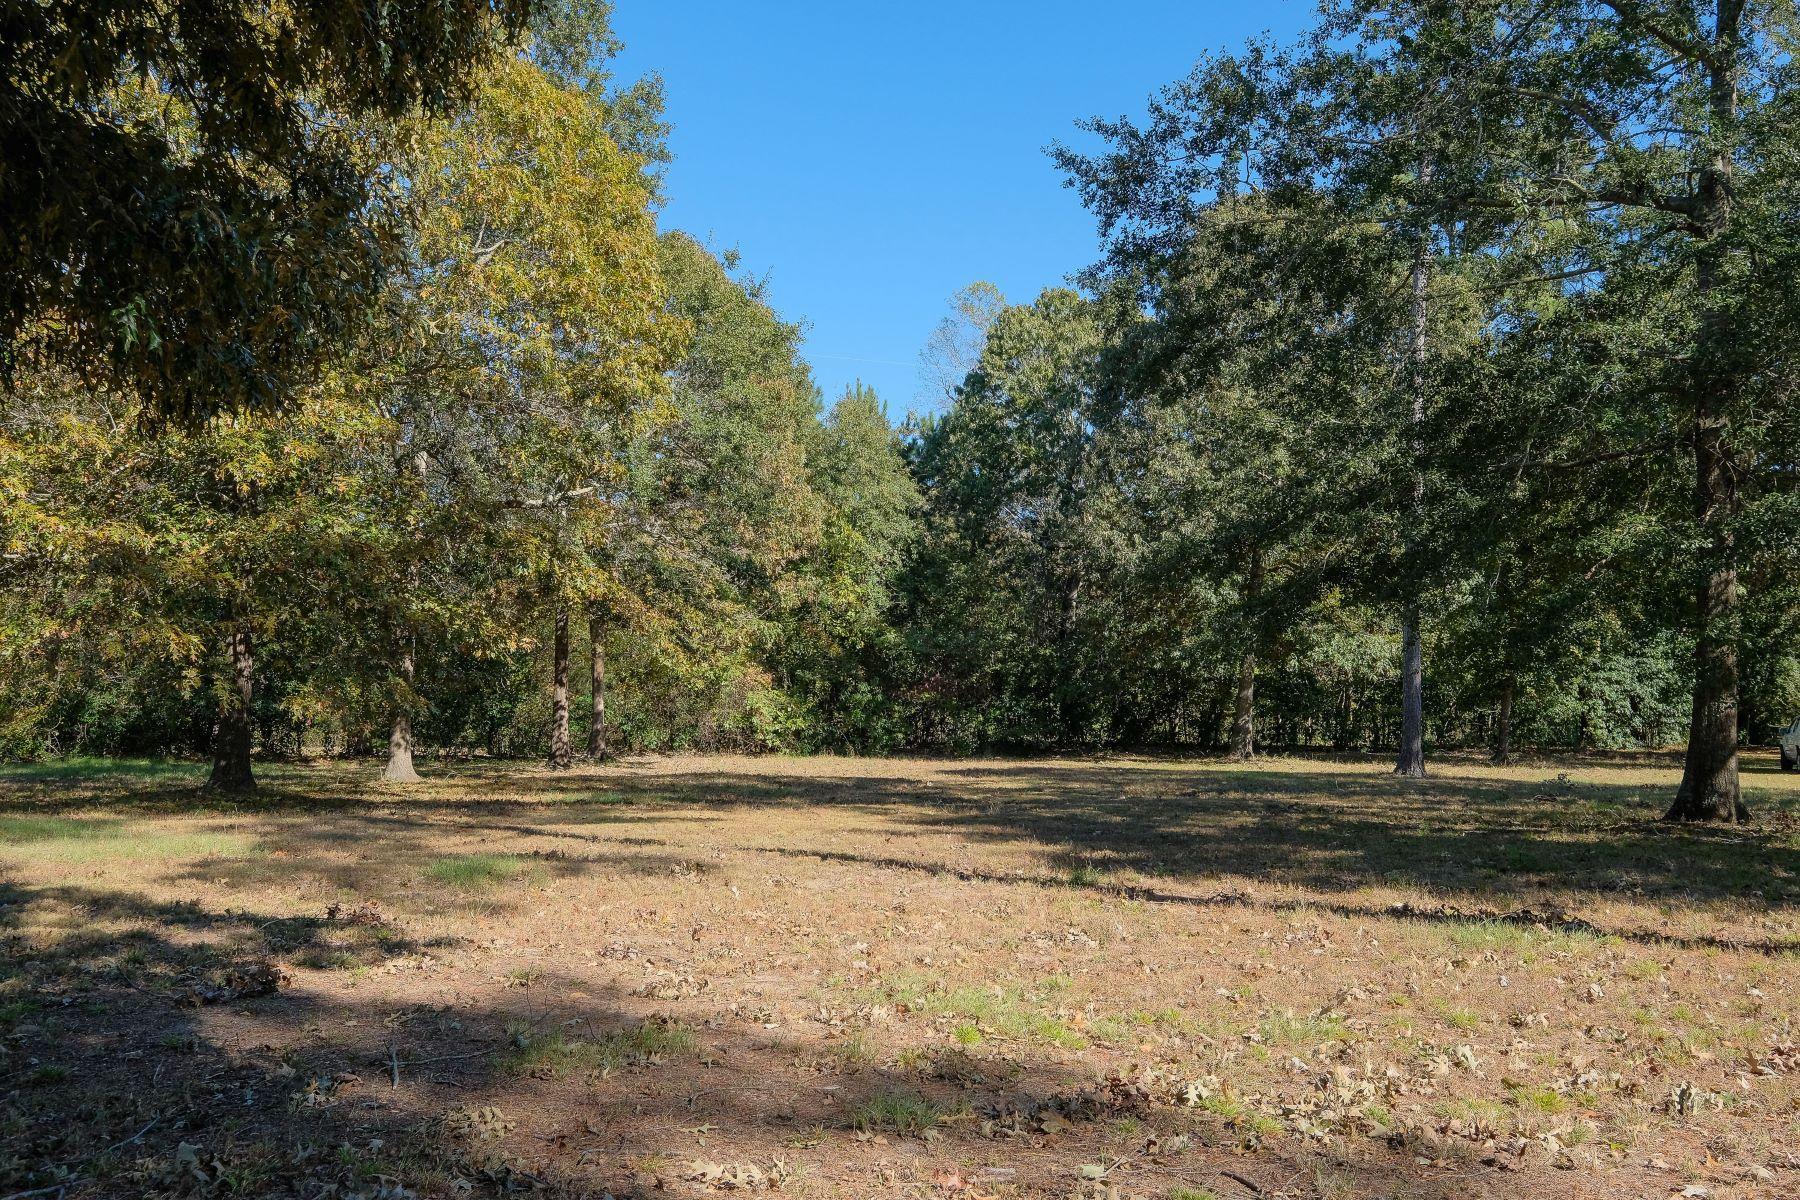 Land for Sale at HOMESITE 87 EDENTON BAY PLANTATION 209 Lake Wood Dr Edenton, North Carolina 27932 United States